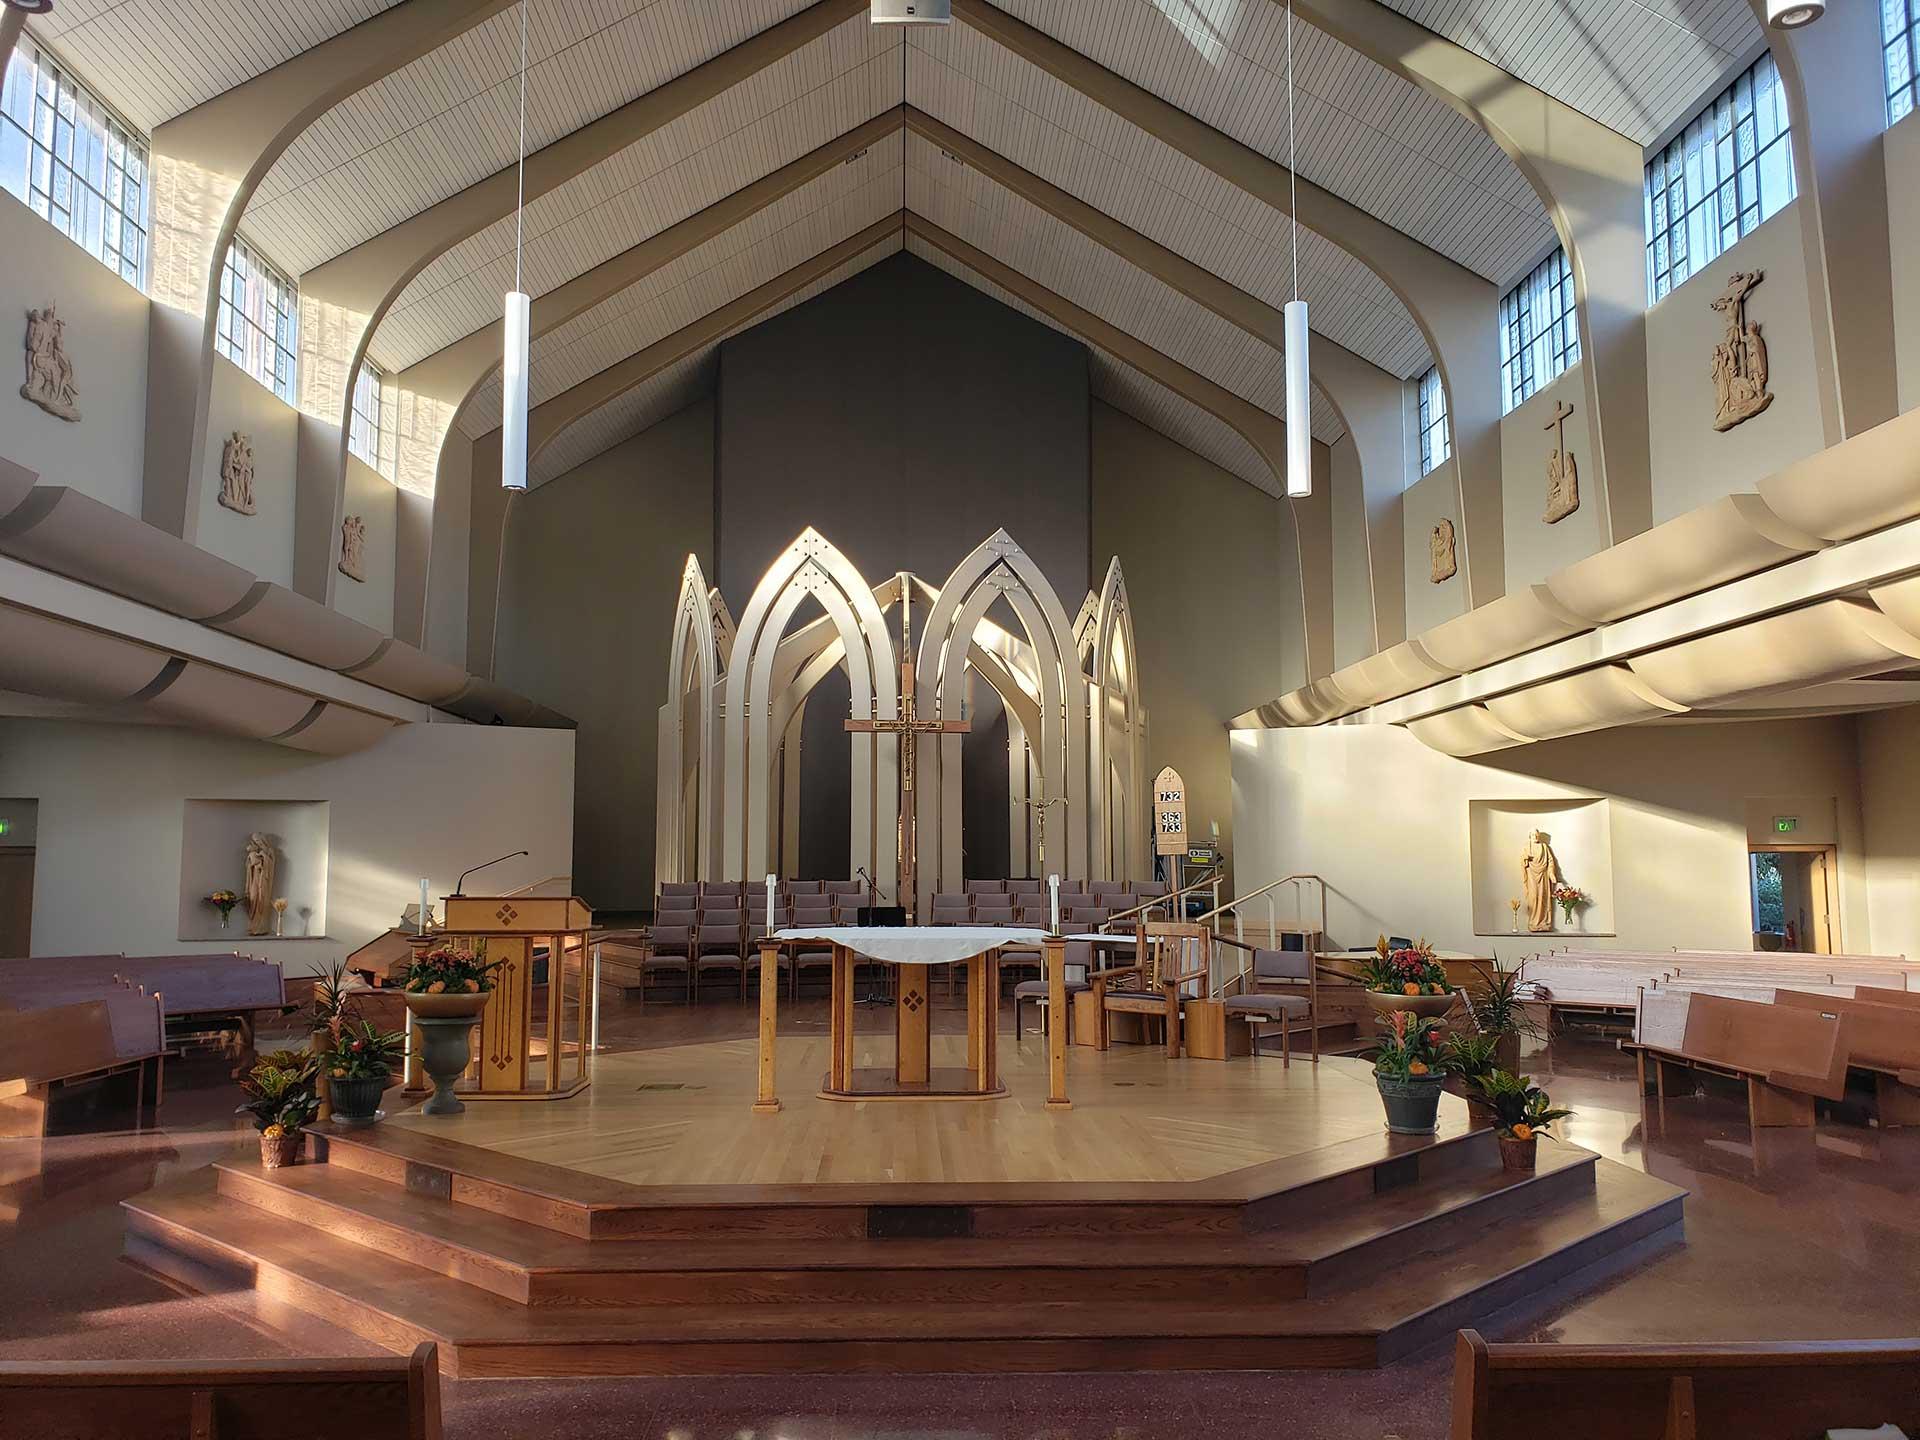 https://www.goudycc.com/wp-content/uploads/2020/12/sacred-heart-church-6.jpg